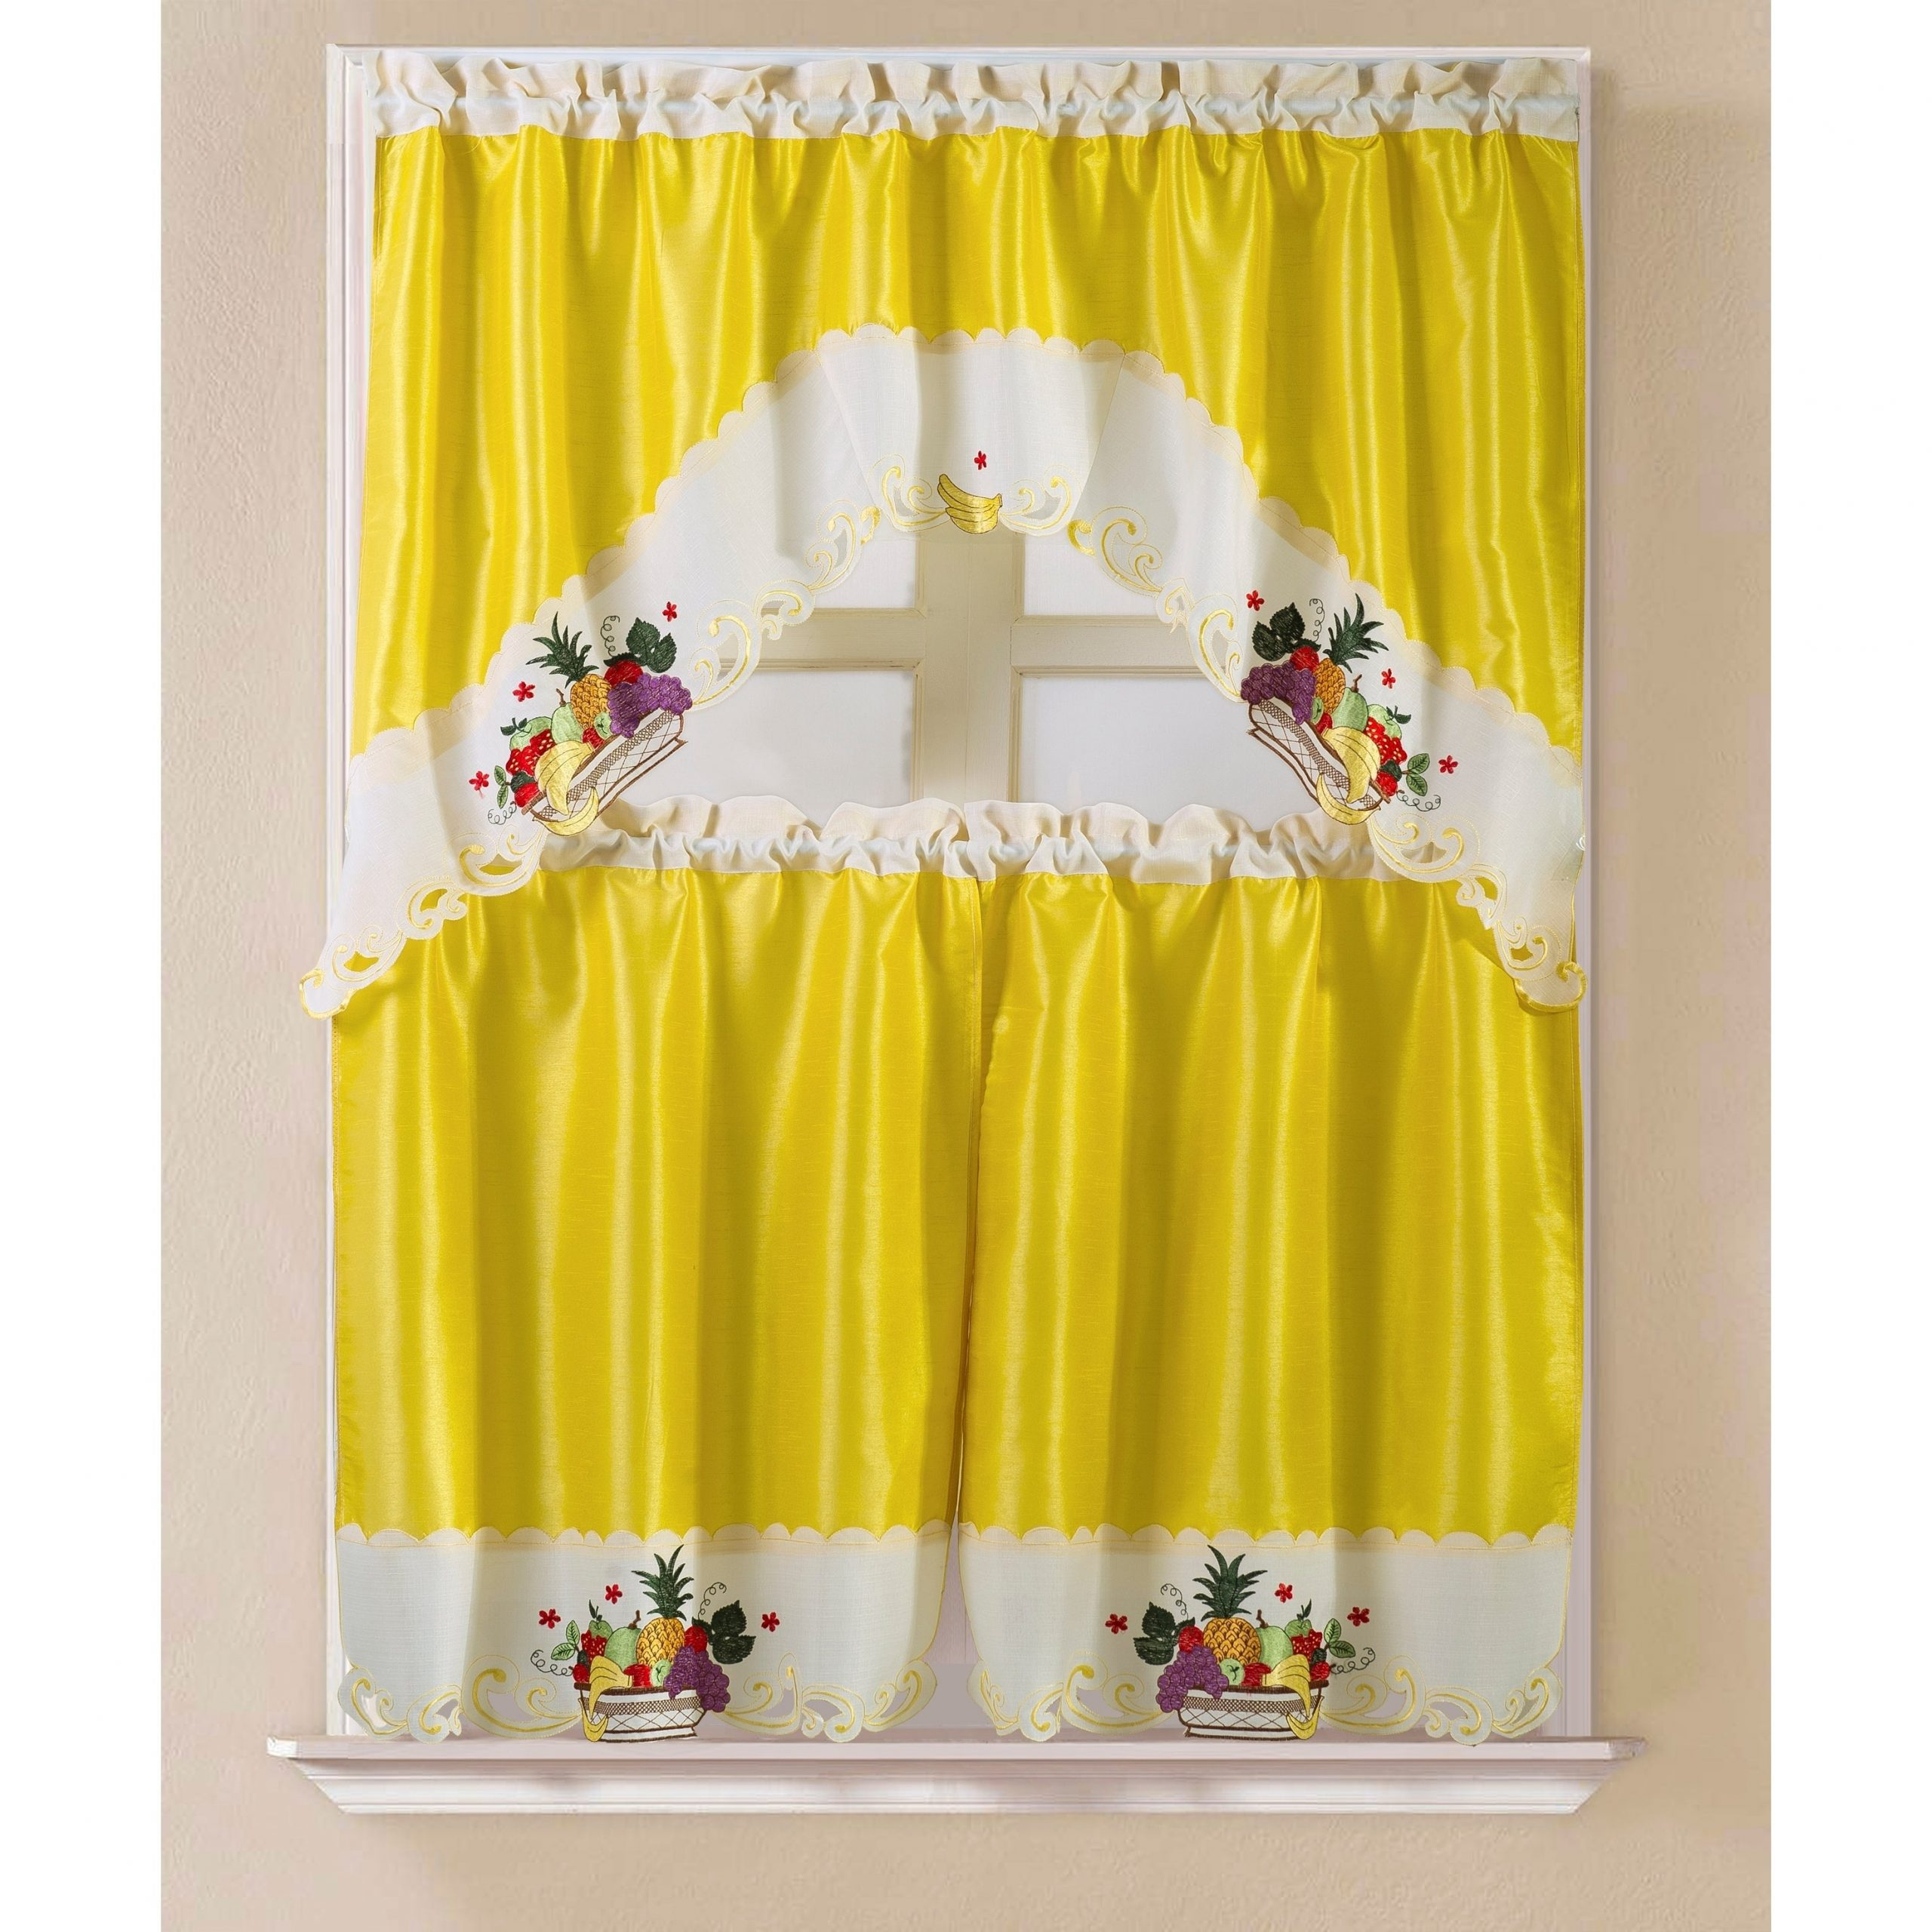 Porch & Den Eastview Faux Silk 3 Piece Kitchen Curtain Set Pertaining To Preferred Faux Silk 3 Piece Kitchen Curtain Sets (View 11 of 20)